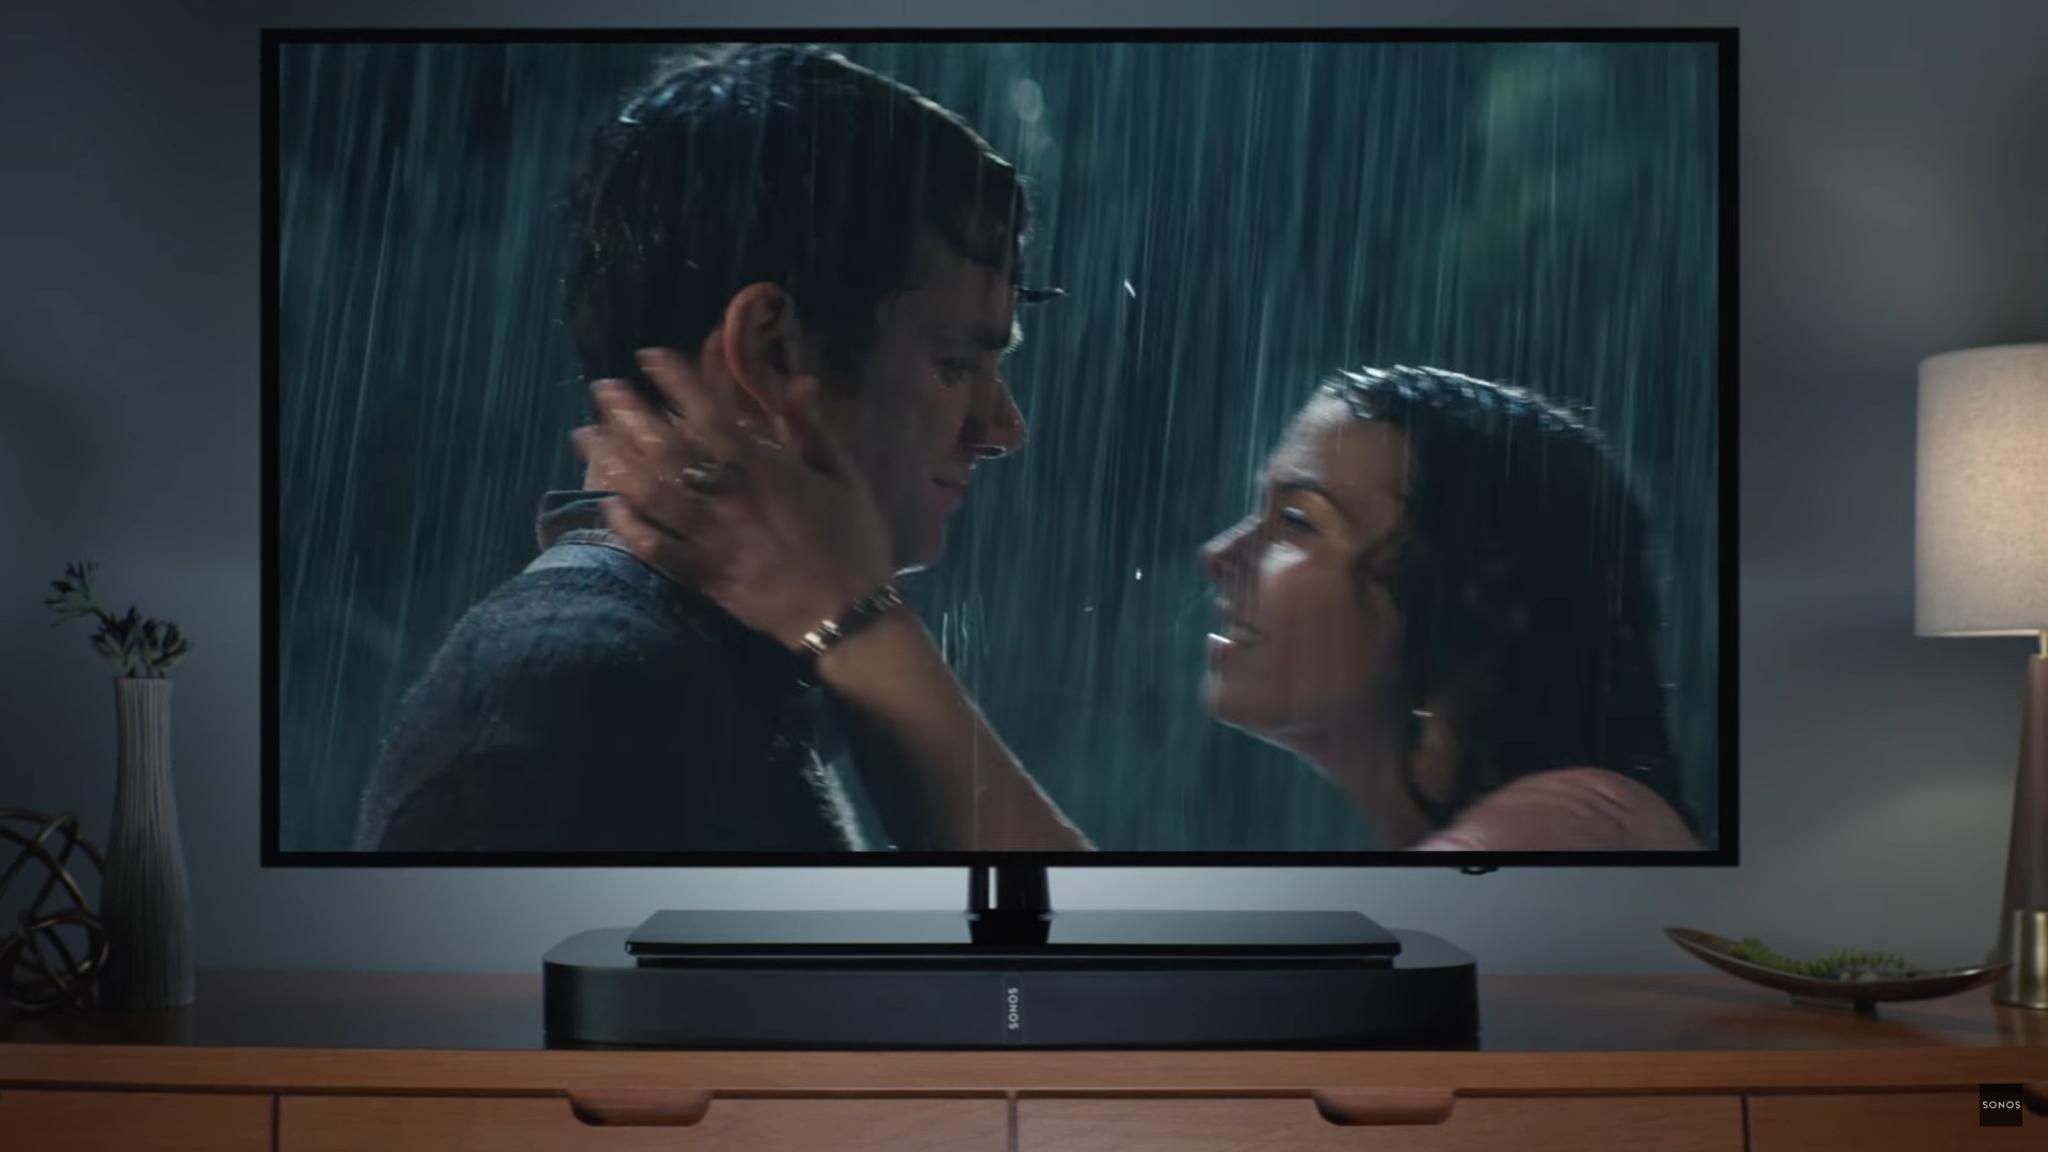 Soundbar, HiFi- & Surround-Anlagen an TV anschließen: So geht\'s